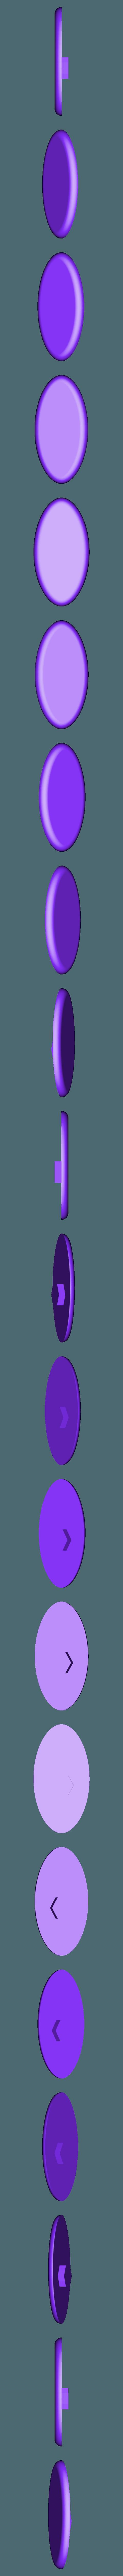 Eye_White_Right.stl Download free STL file Rainbow Toucan • 3D printing template, 3rdesignworks